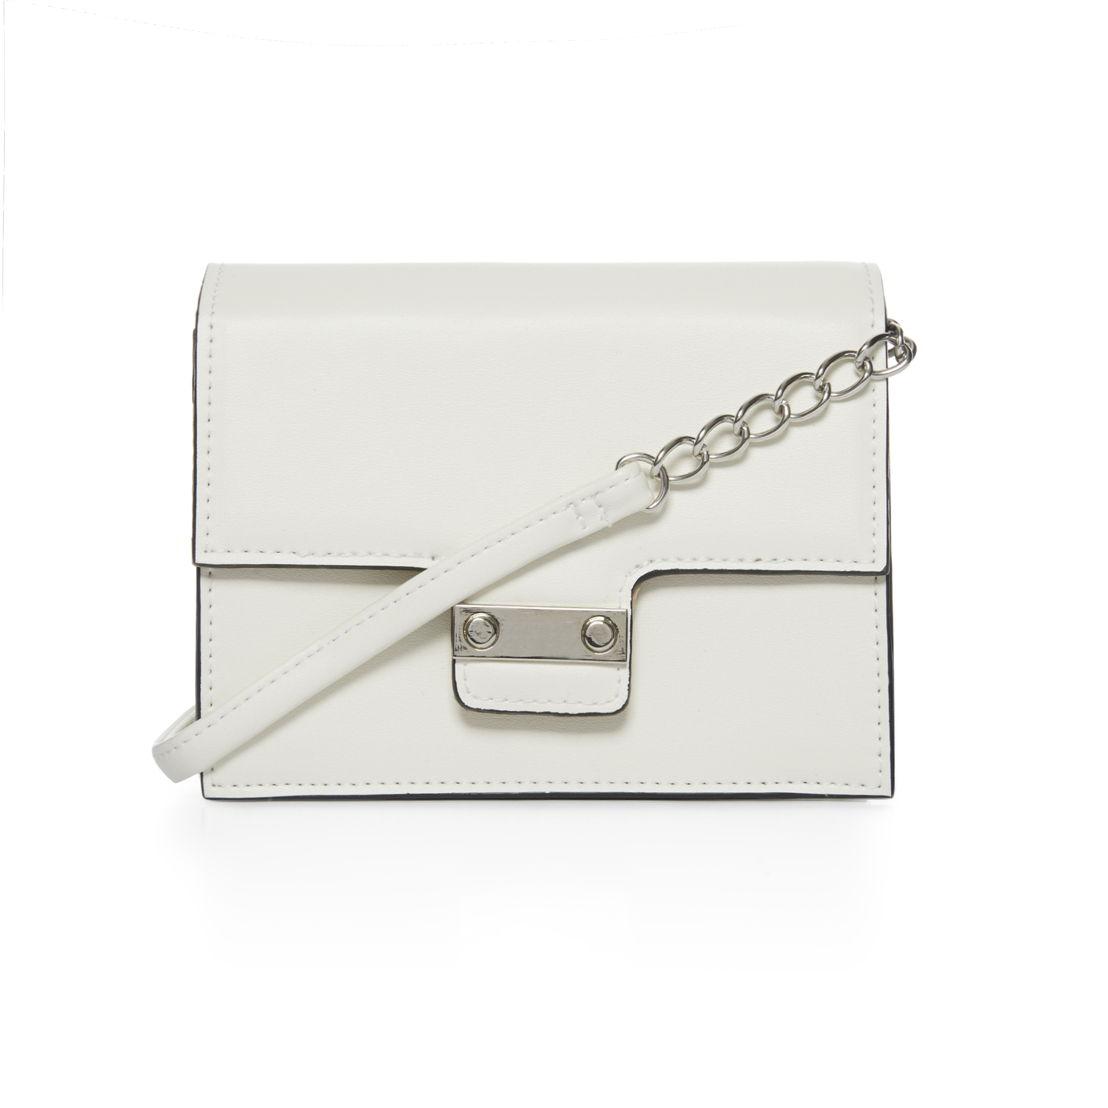 Primark - White Mini Buckle and Chain Xbody Bag - 5€